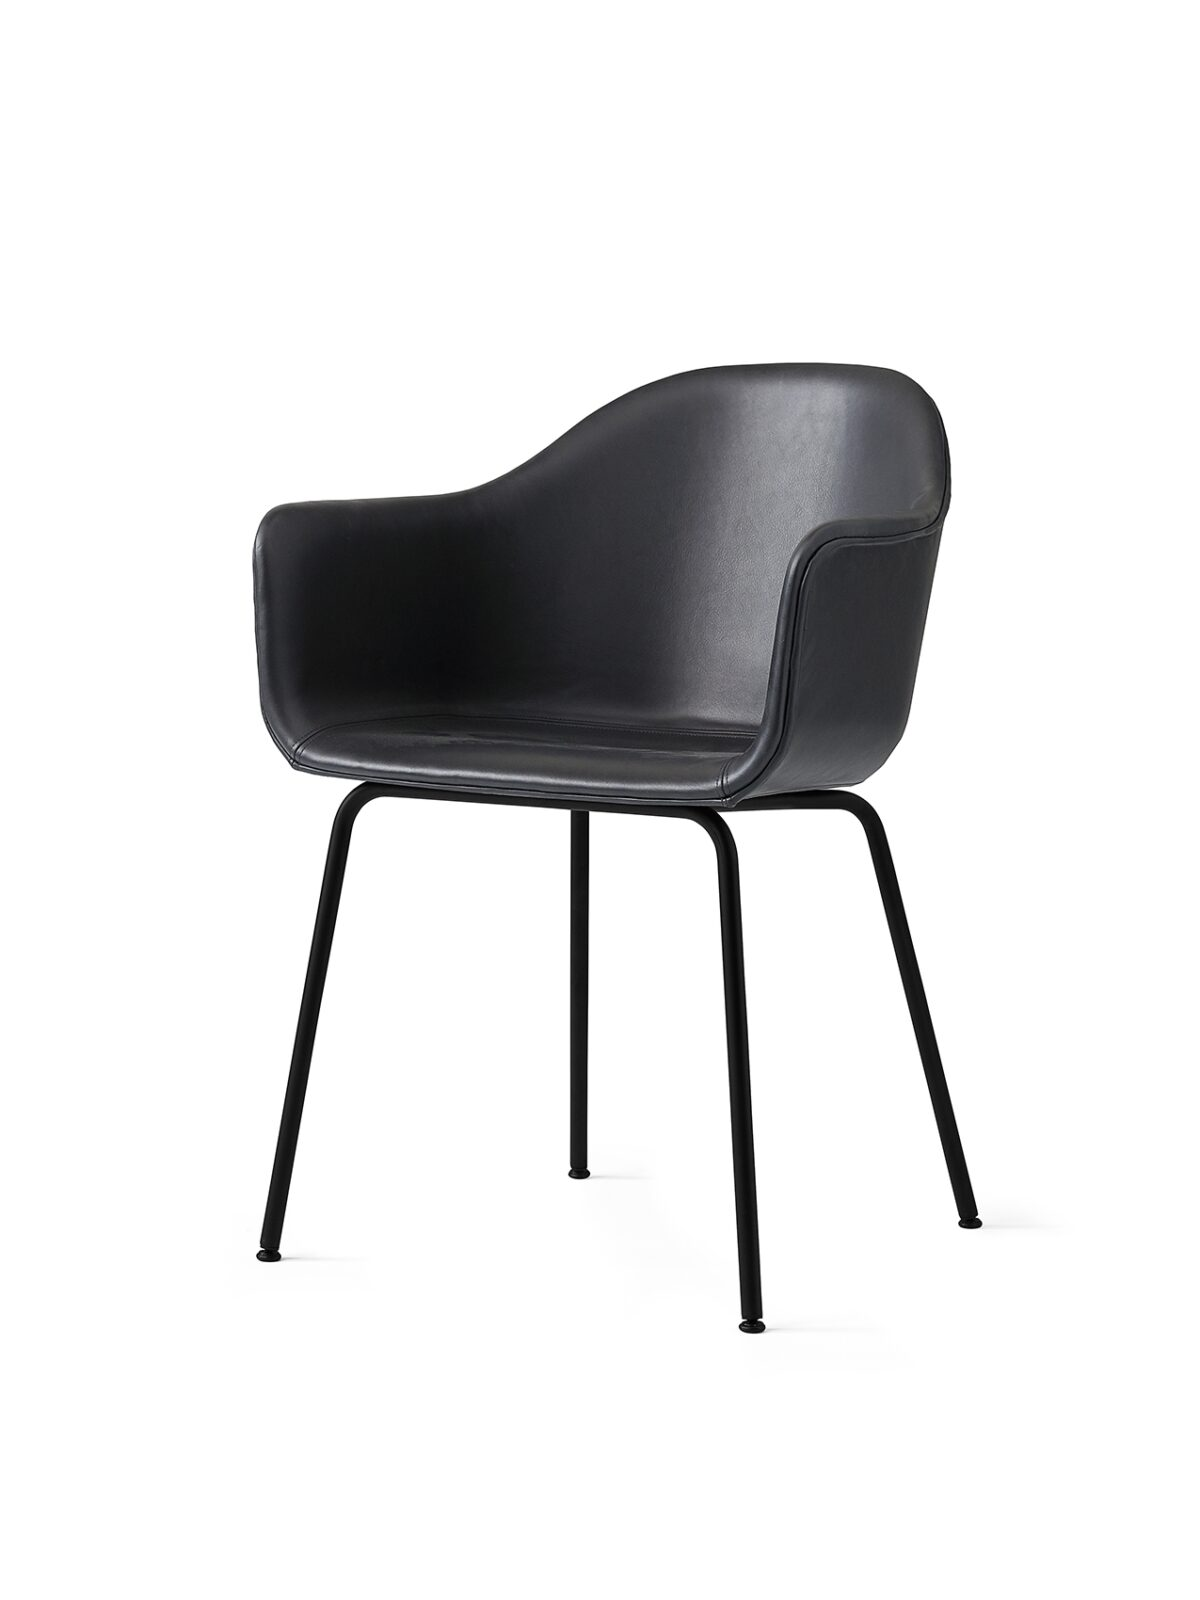 9355559 Harbour Chair DakarBlack0842 Black Angle 1